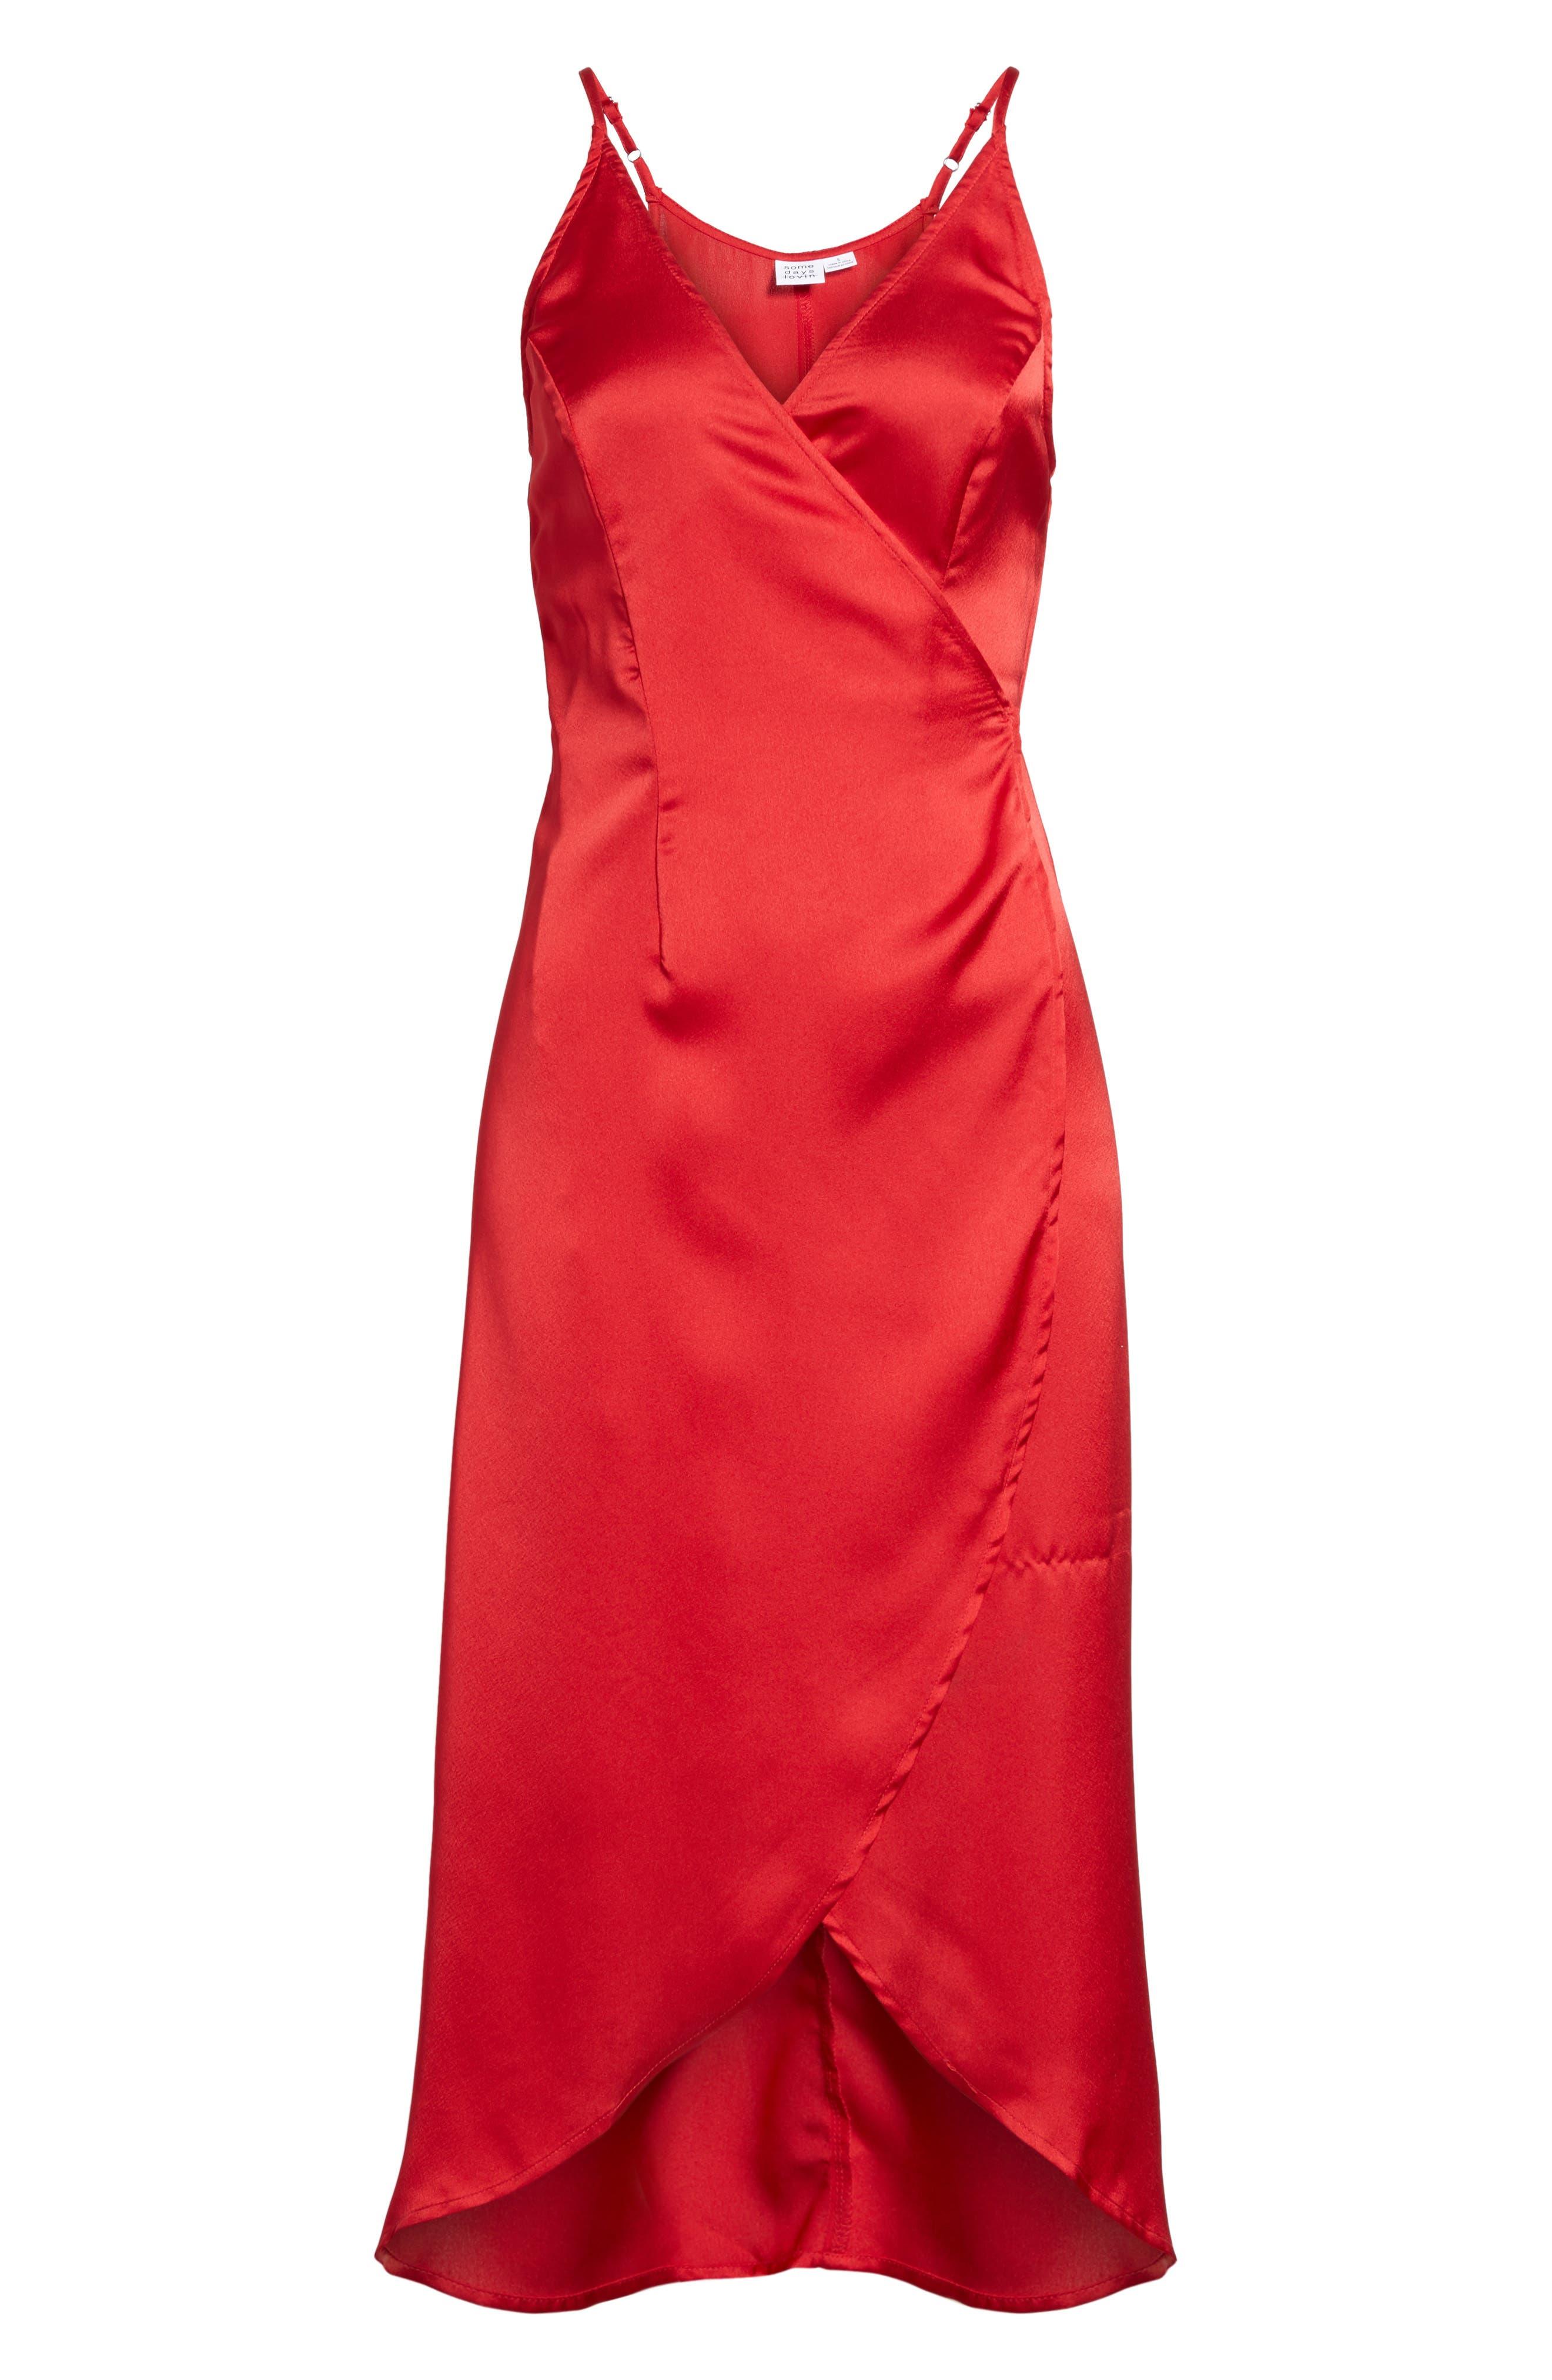 Evening Sun Satin Wrap Dress,                             Alternate thumbnail 6, color,                             600